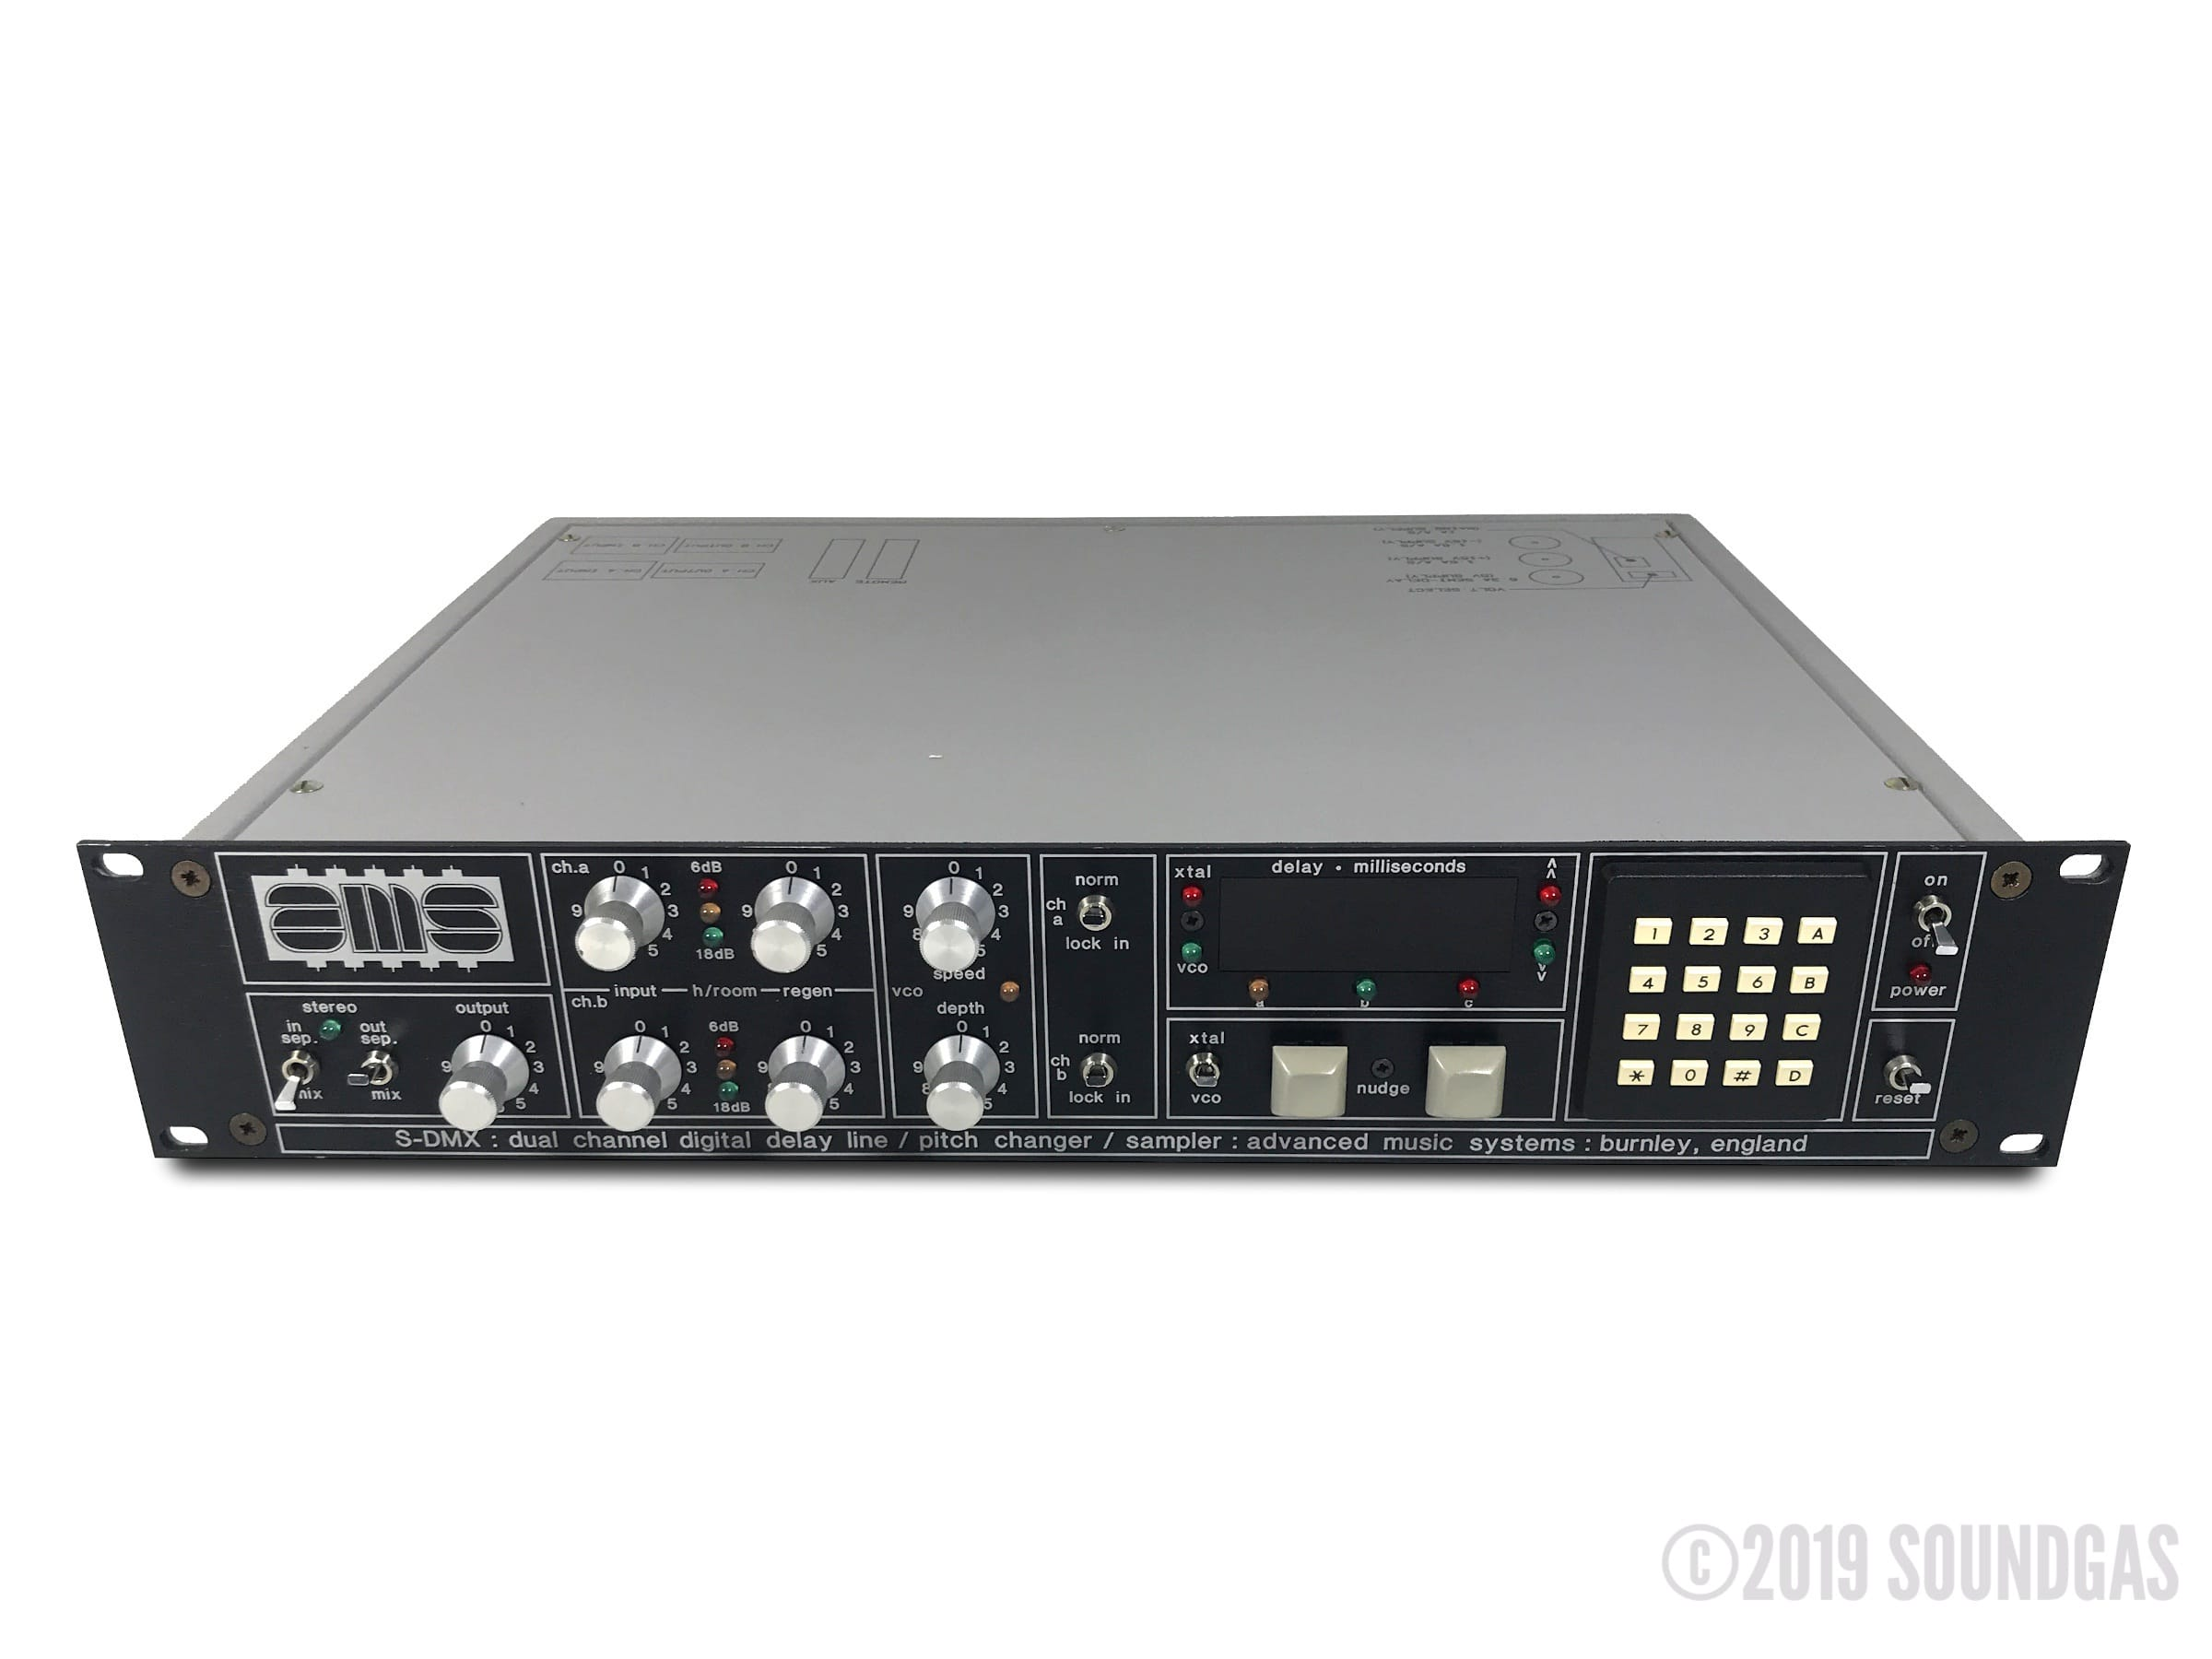 AMS-SDMX-Digital-Delay-Pitch-Shifter-Sampler-Cover-2